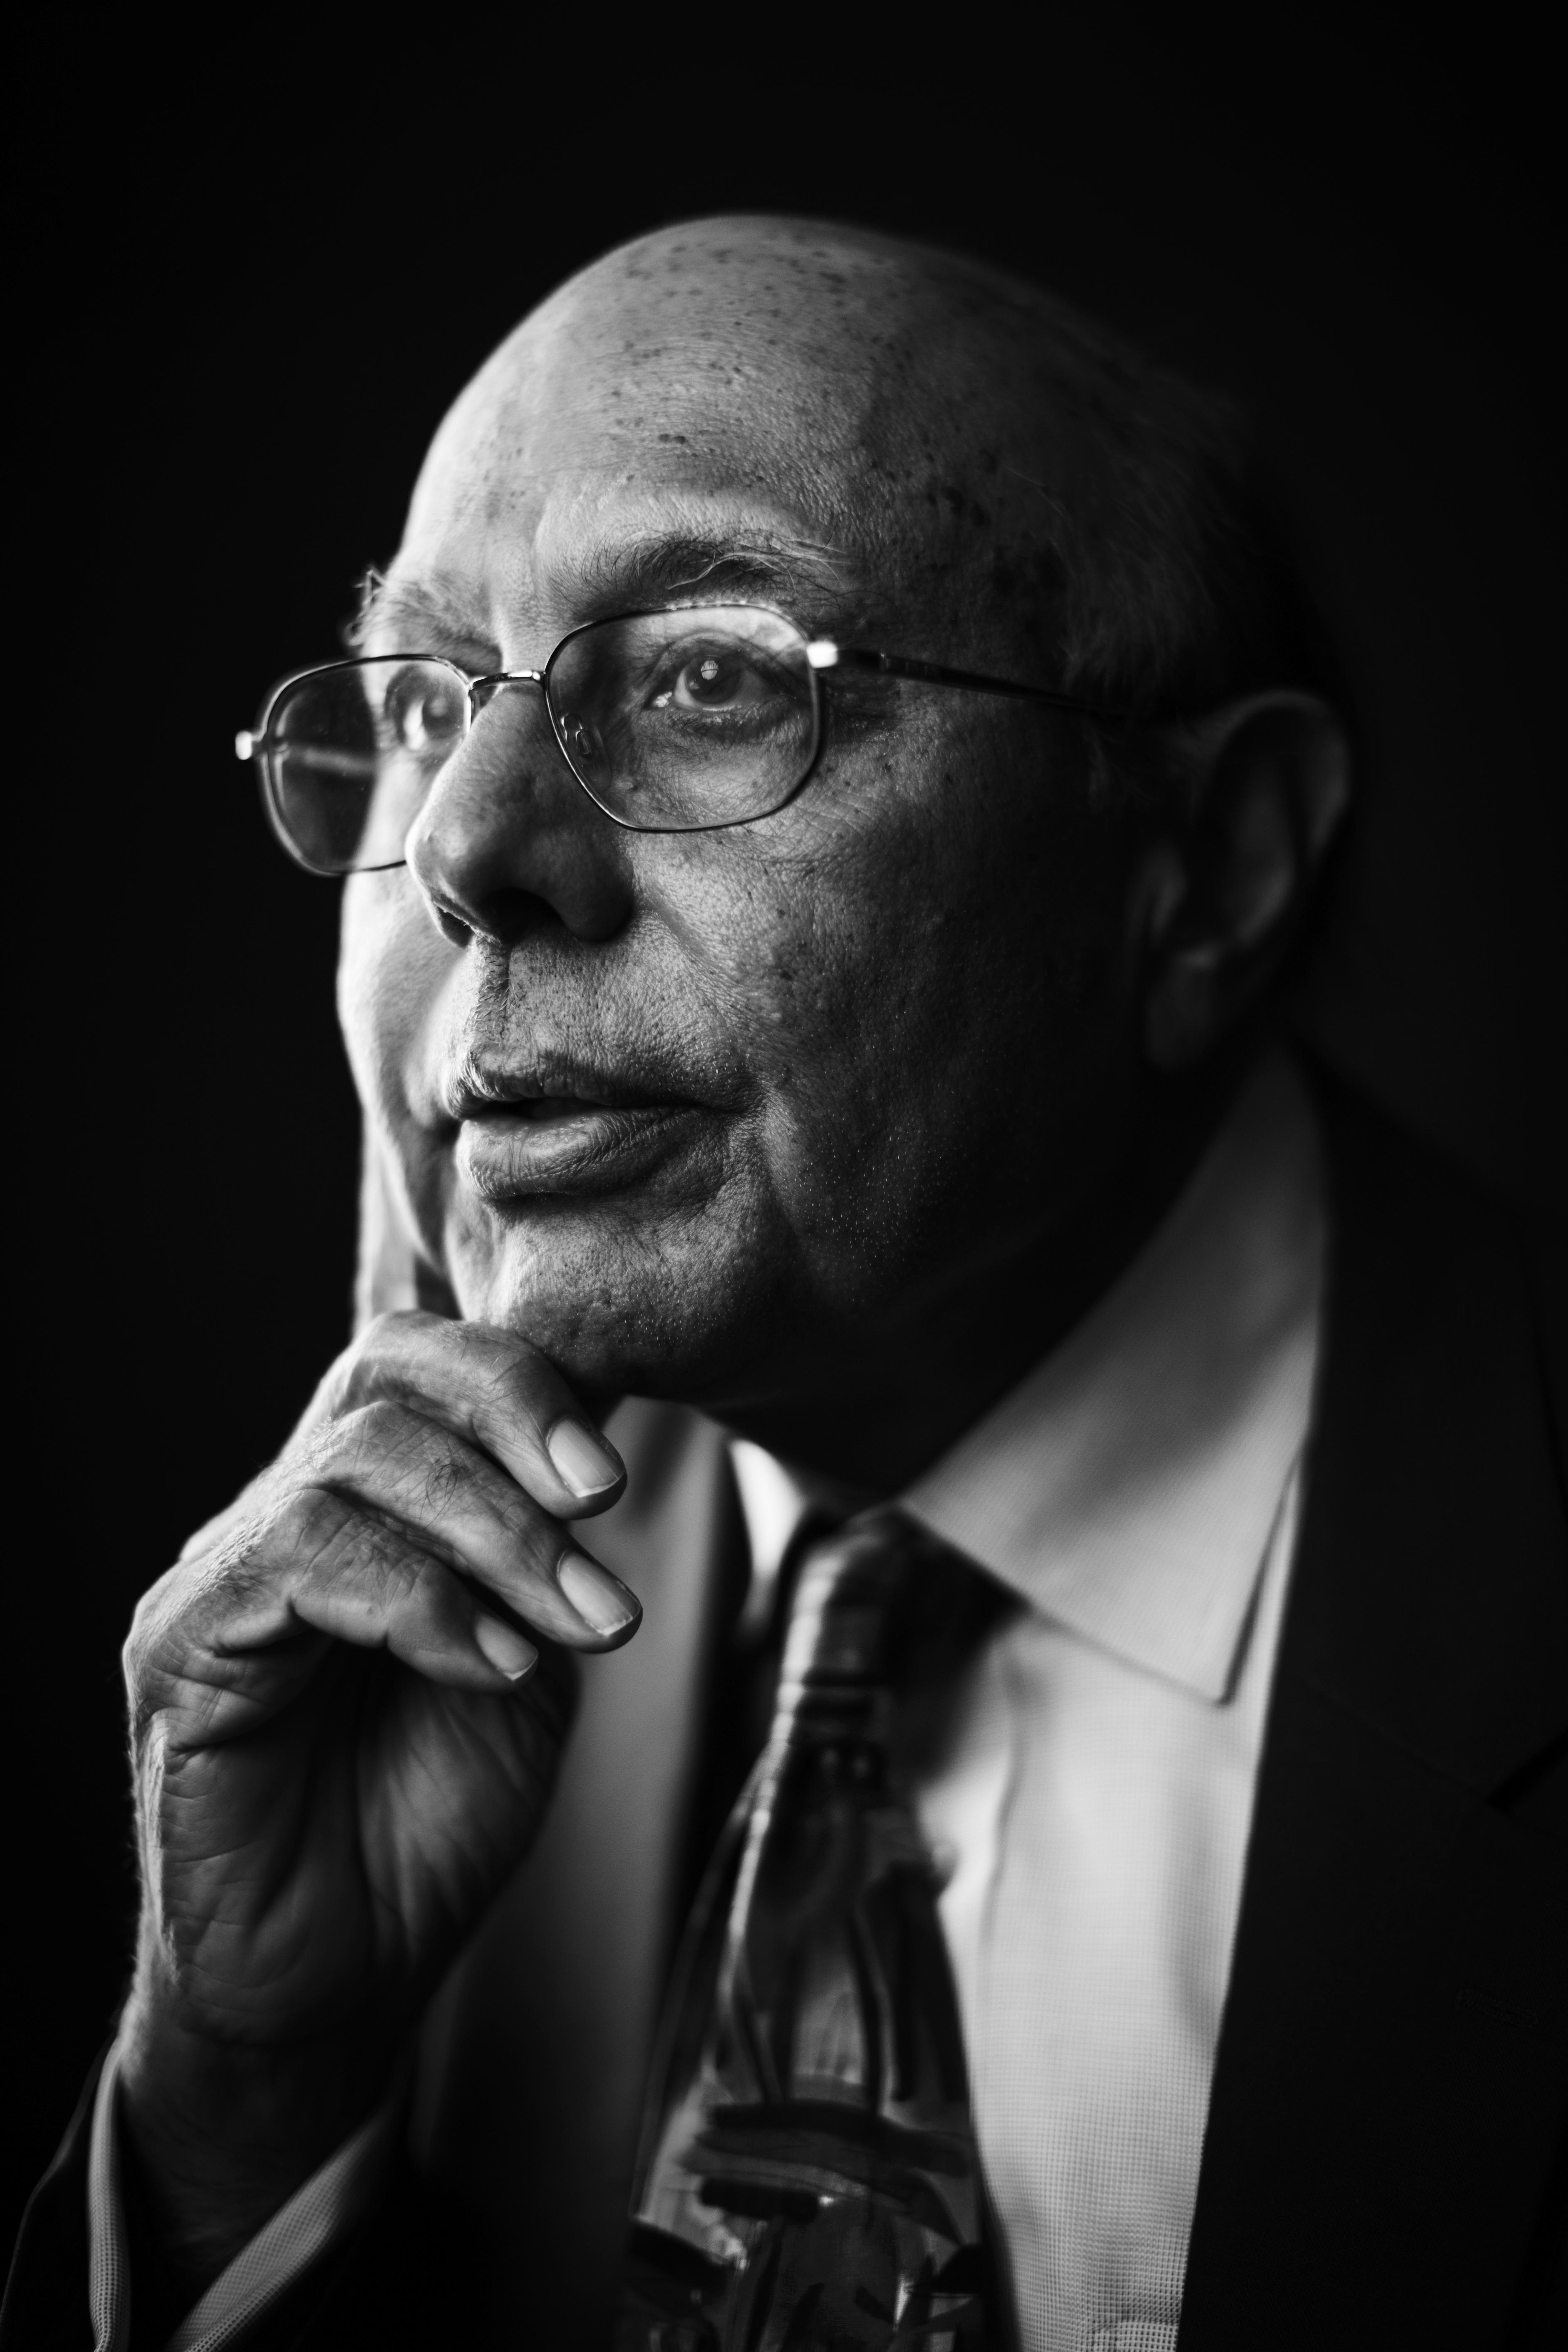 11/03/16 - BOSTON, MA. - Vinod Sahney poses for a portrait on Nov. 3, 2016.  Photo by Adam Glanzman/Northeastern University